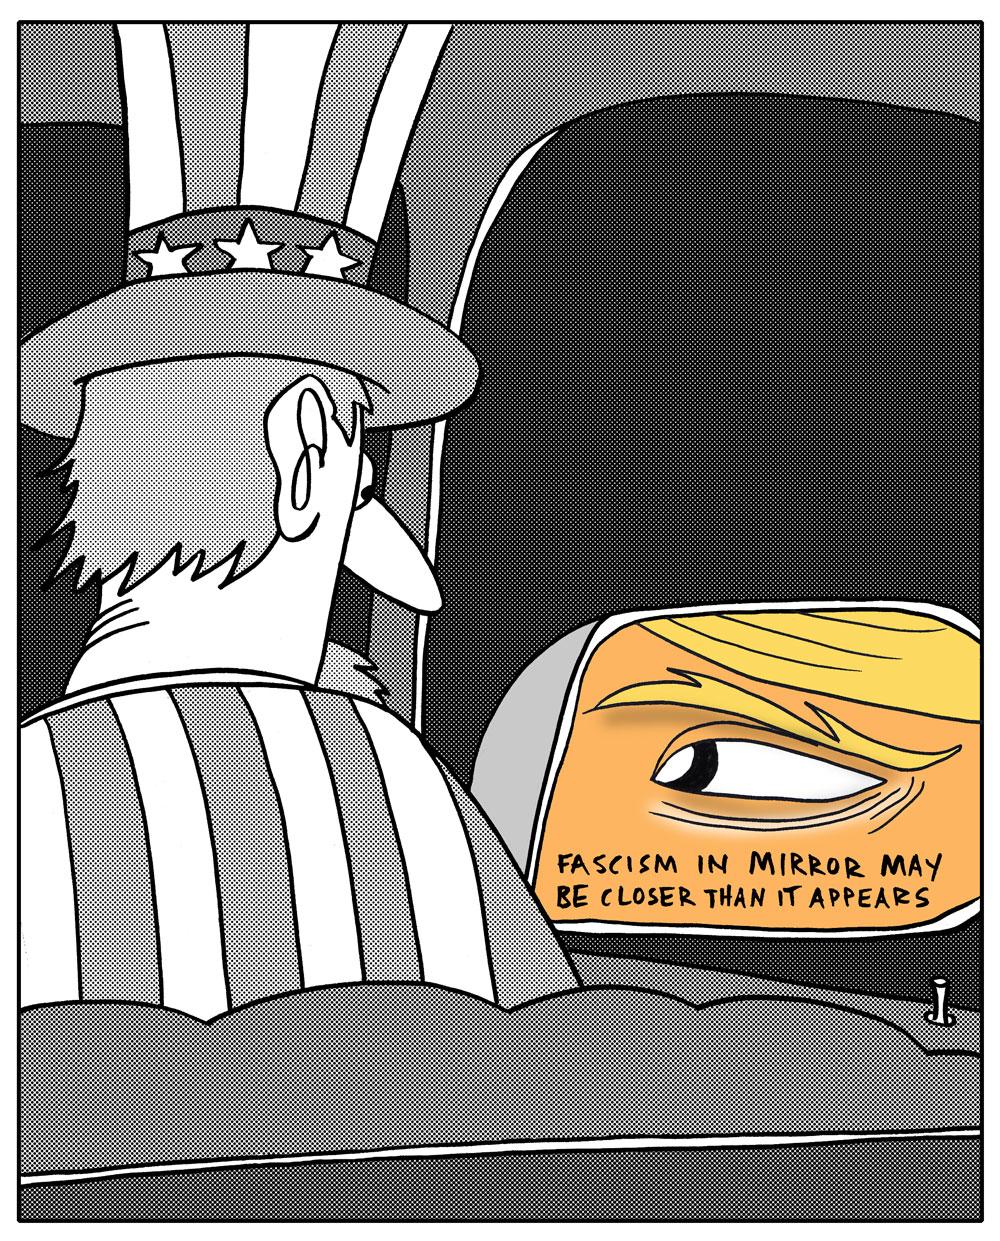 far-side-parody-fascism.jpg